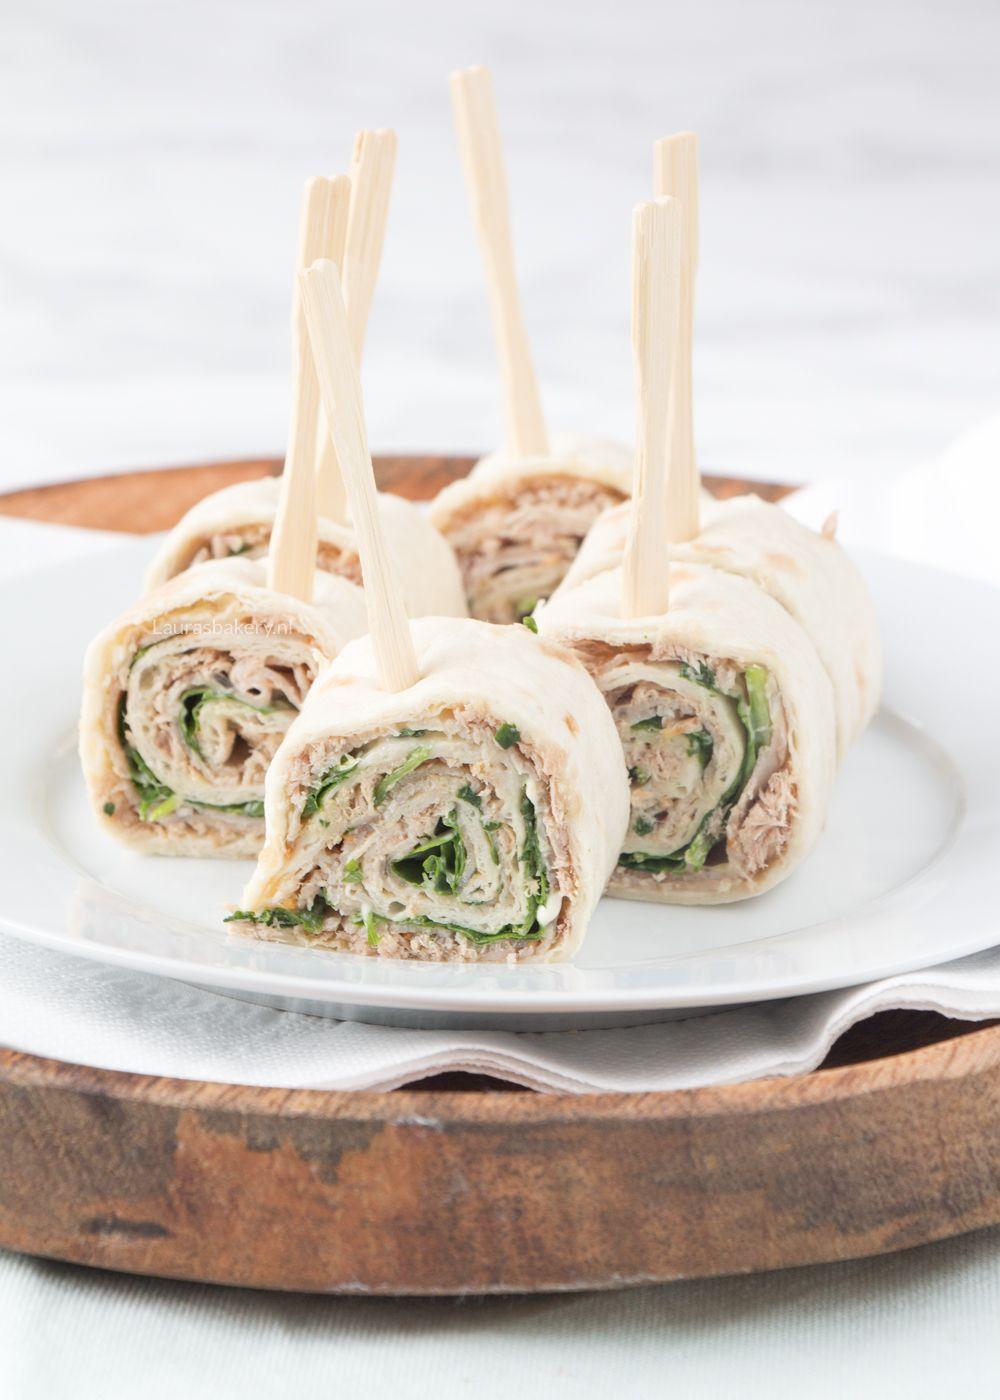 Verbazingwekkend Vitello tonnato wrap hapjes - Laura's Bakery EK-33